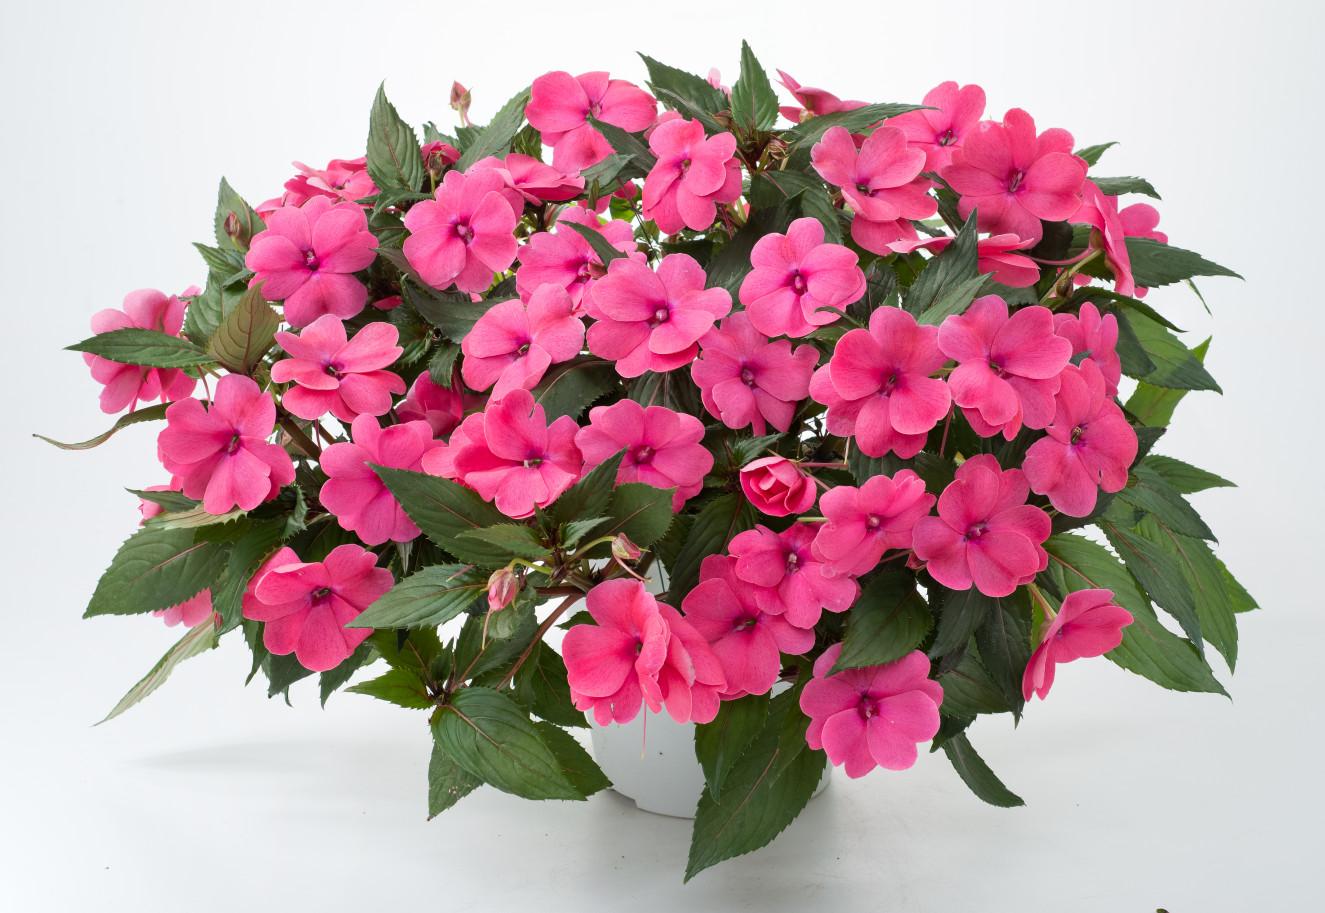 Sun Harmony™ Deep Pink- bm-12-169-dan-1342-Edit(14-15)